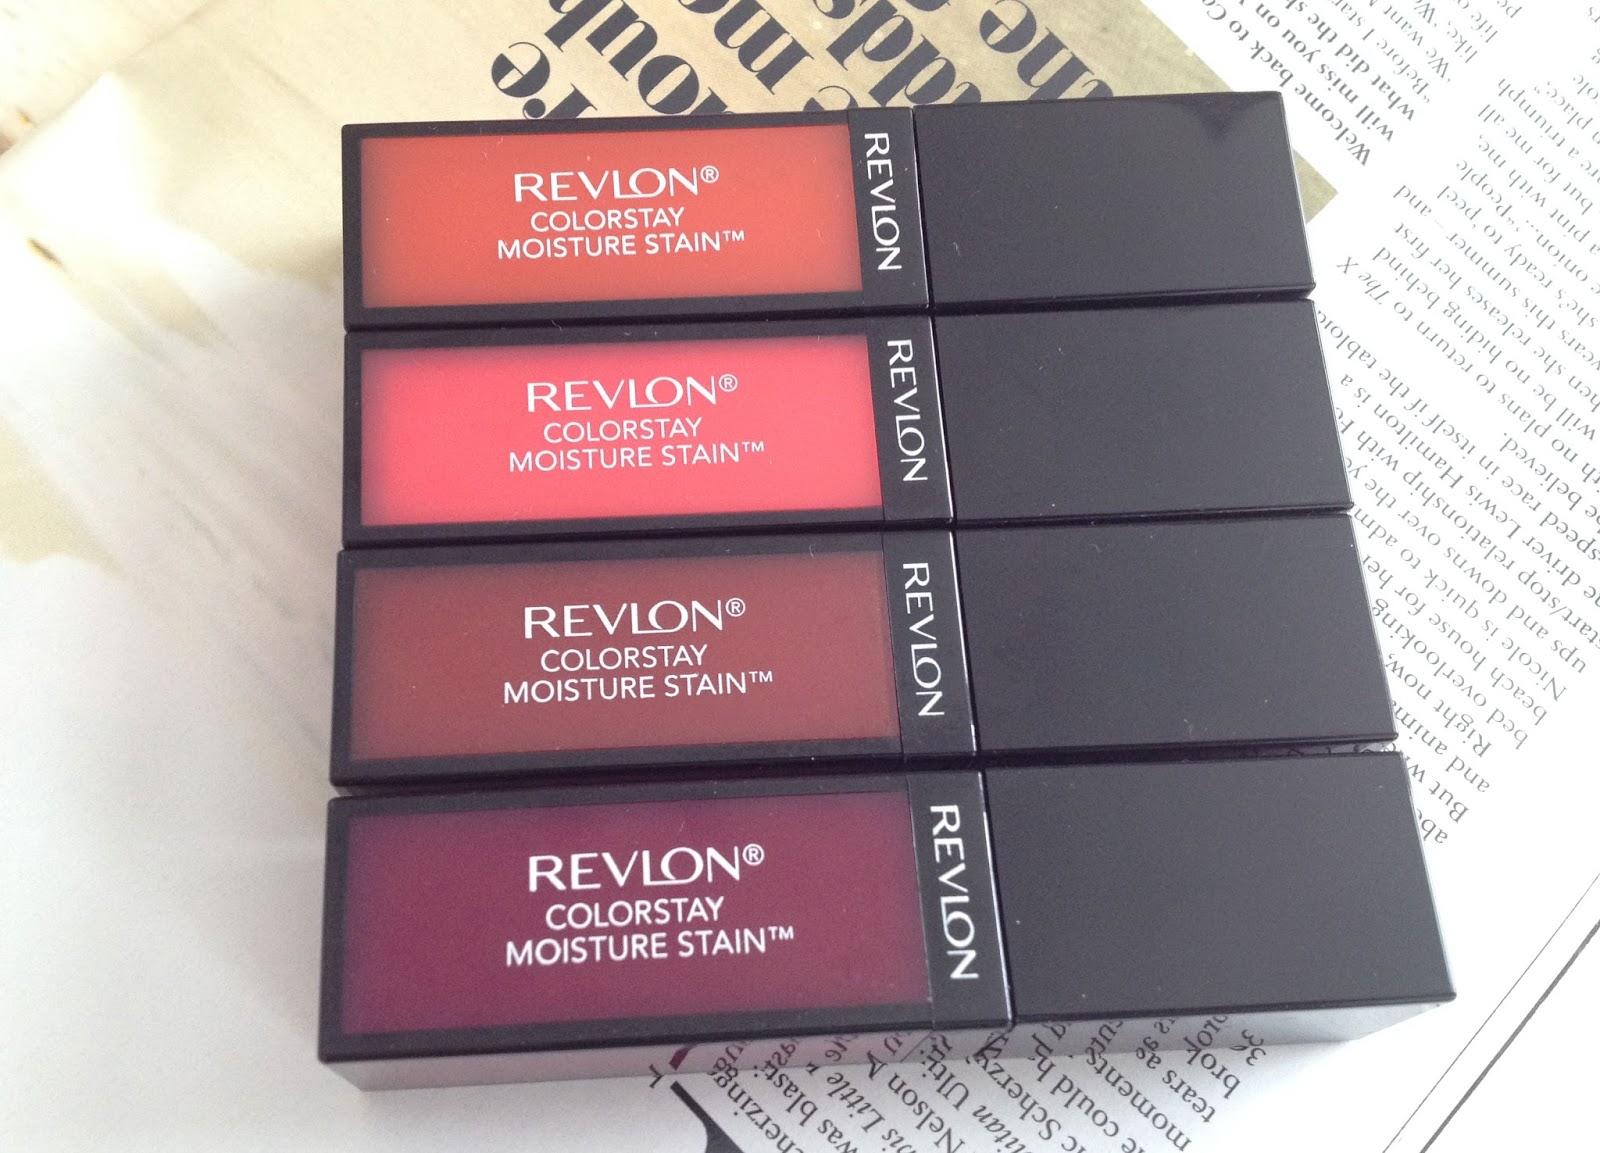 Revlon Colorstay Moisture Stains